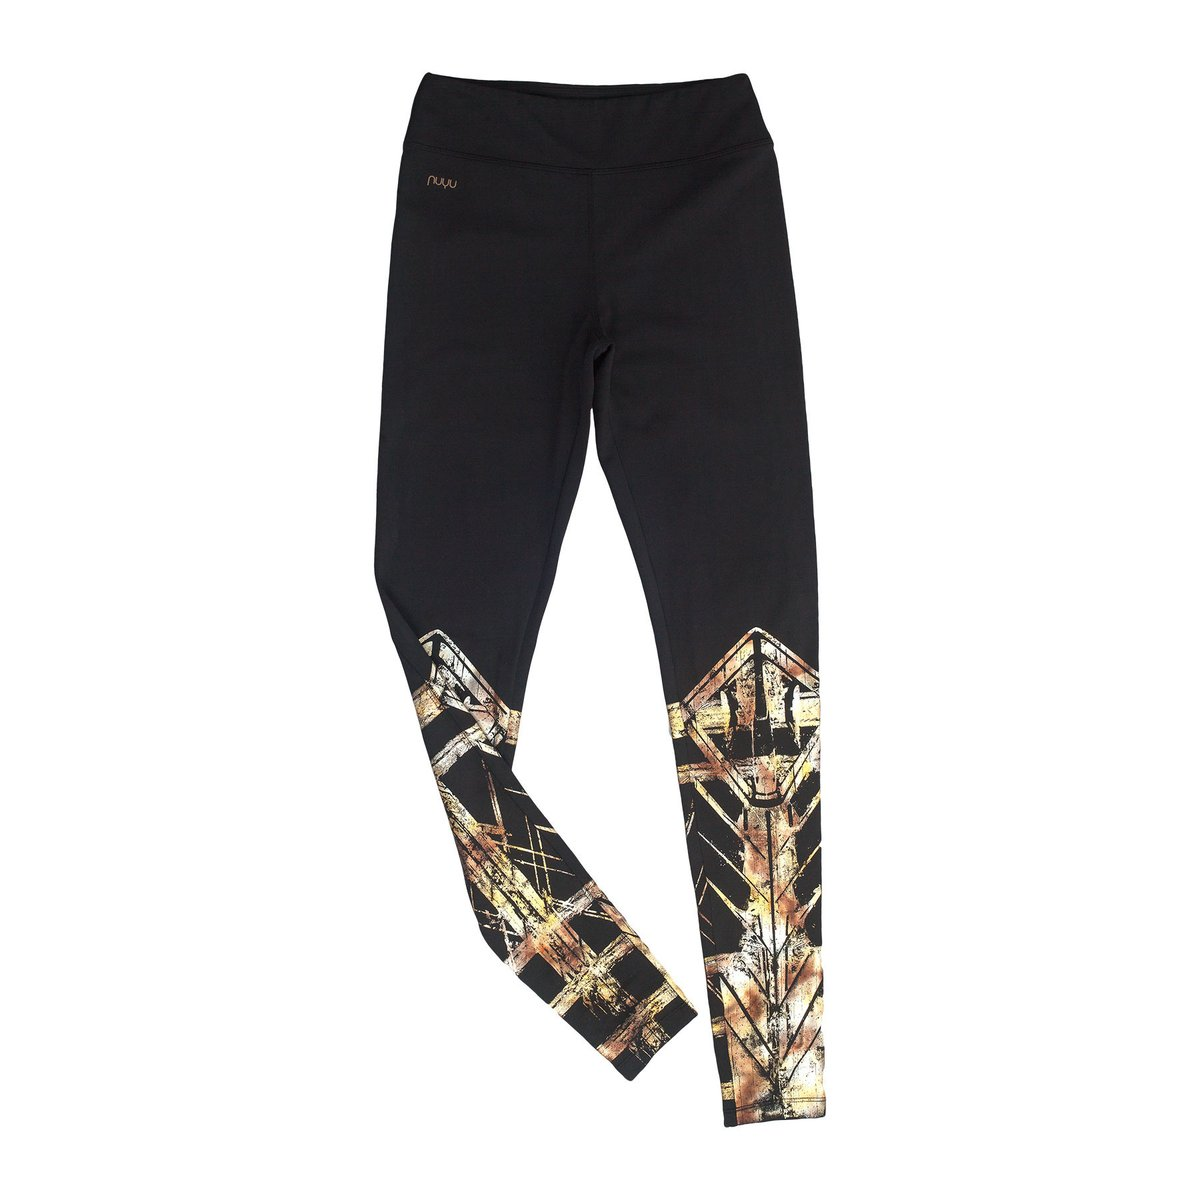 wonder_woman_athletic_apparel_legging.jpg